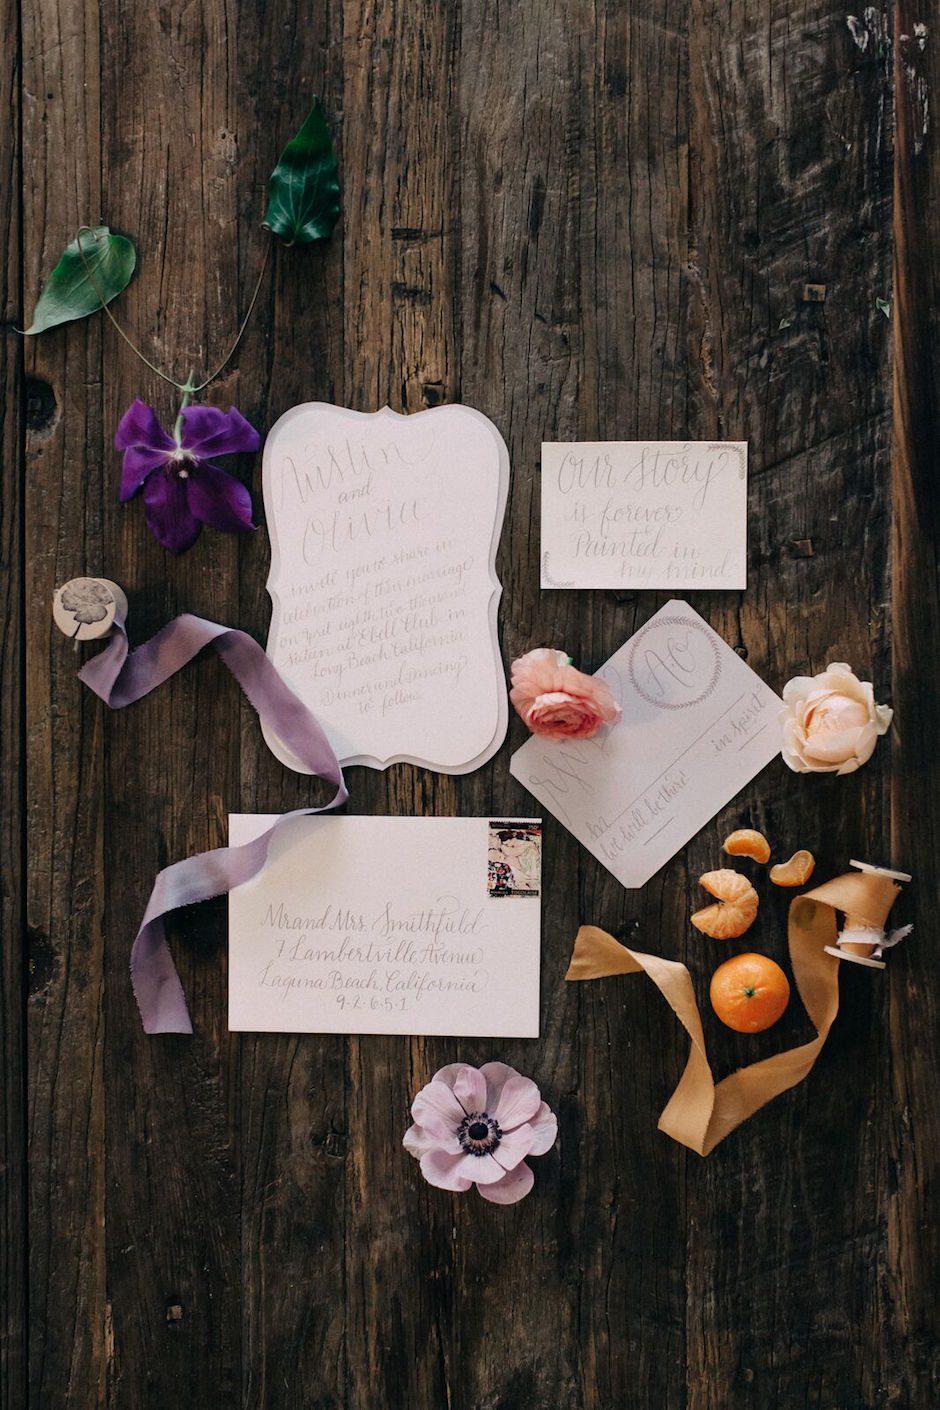 EbellofLongBeach-RevelPetals-HailleyHowardPhotography-WeddingChicks2